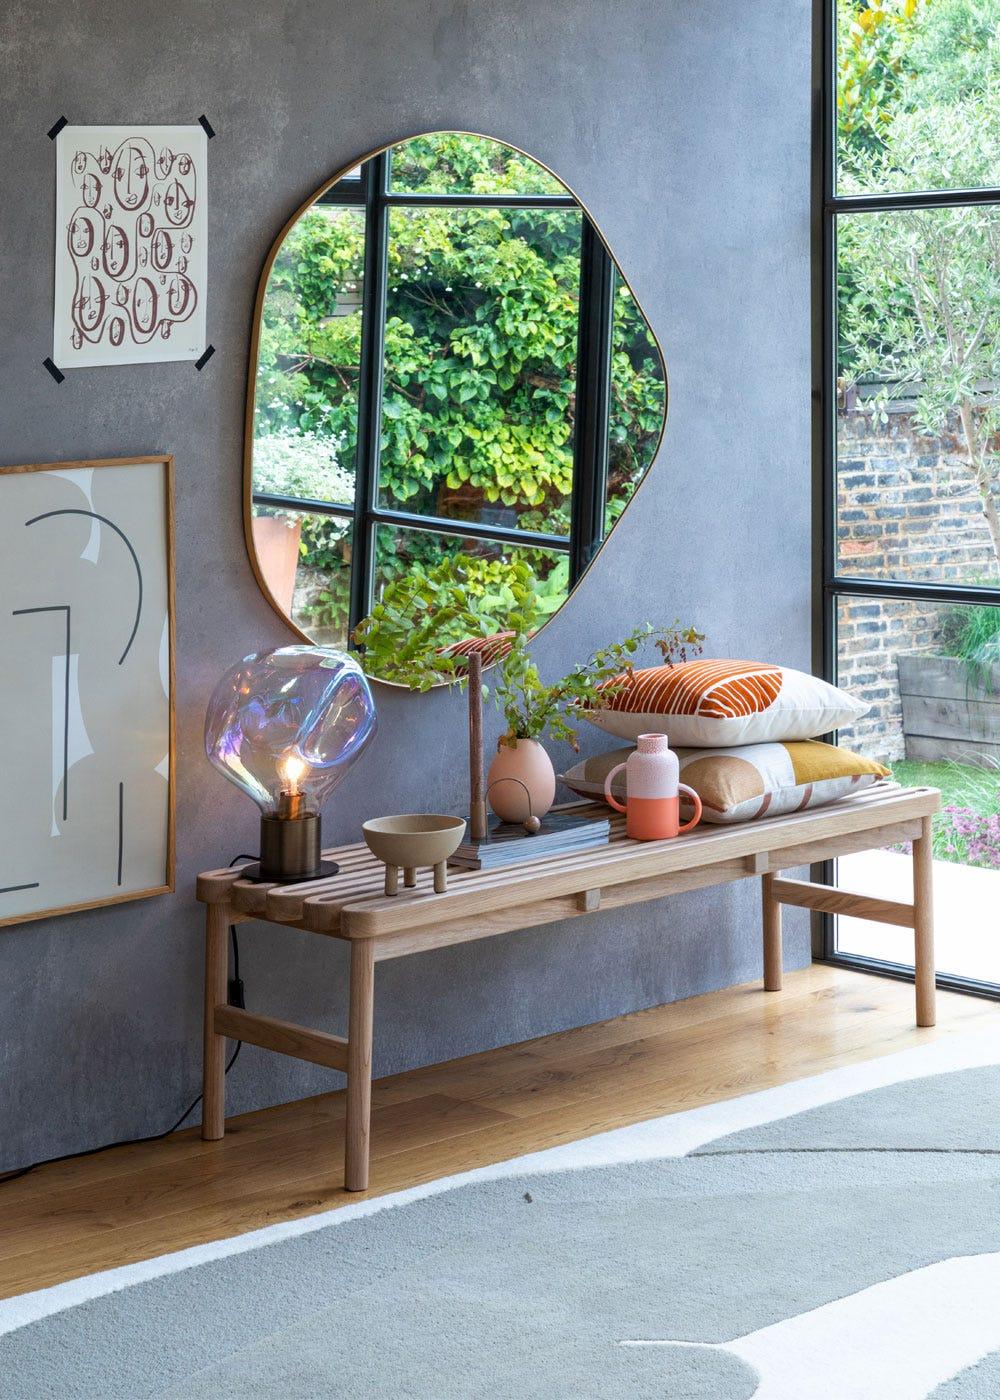 As shown: Bolha table lamp, organic fine edge mirror, studio gud twine bench.